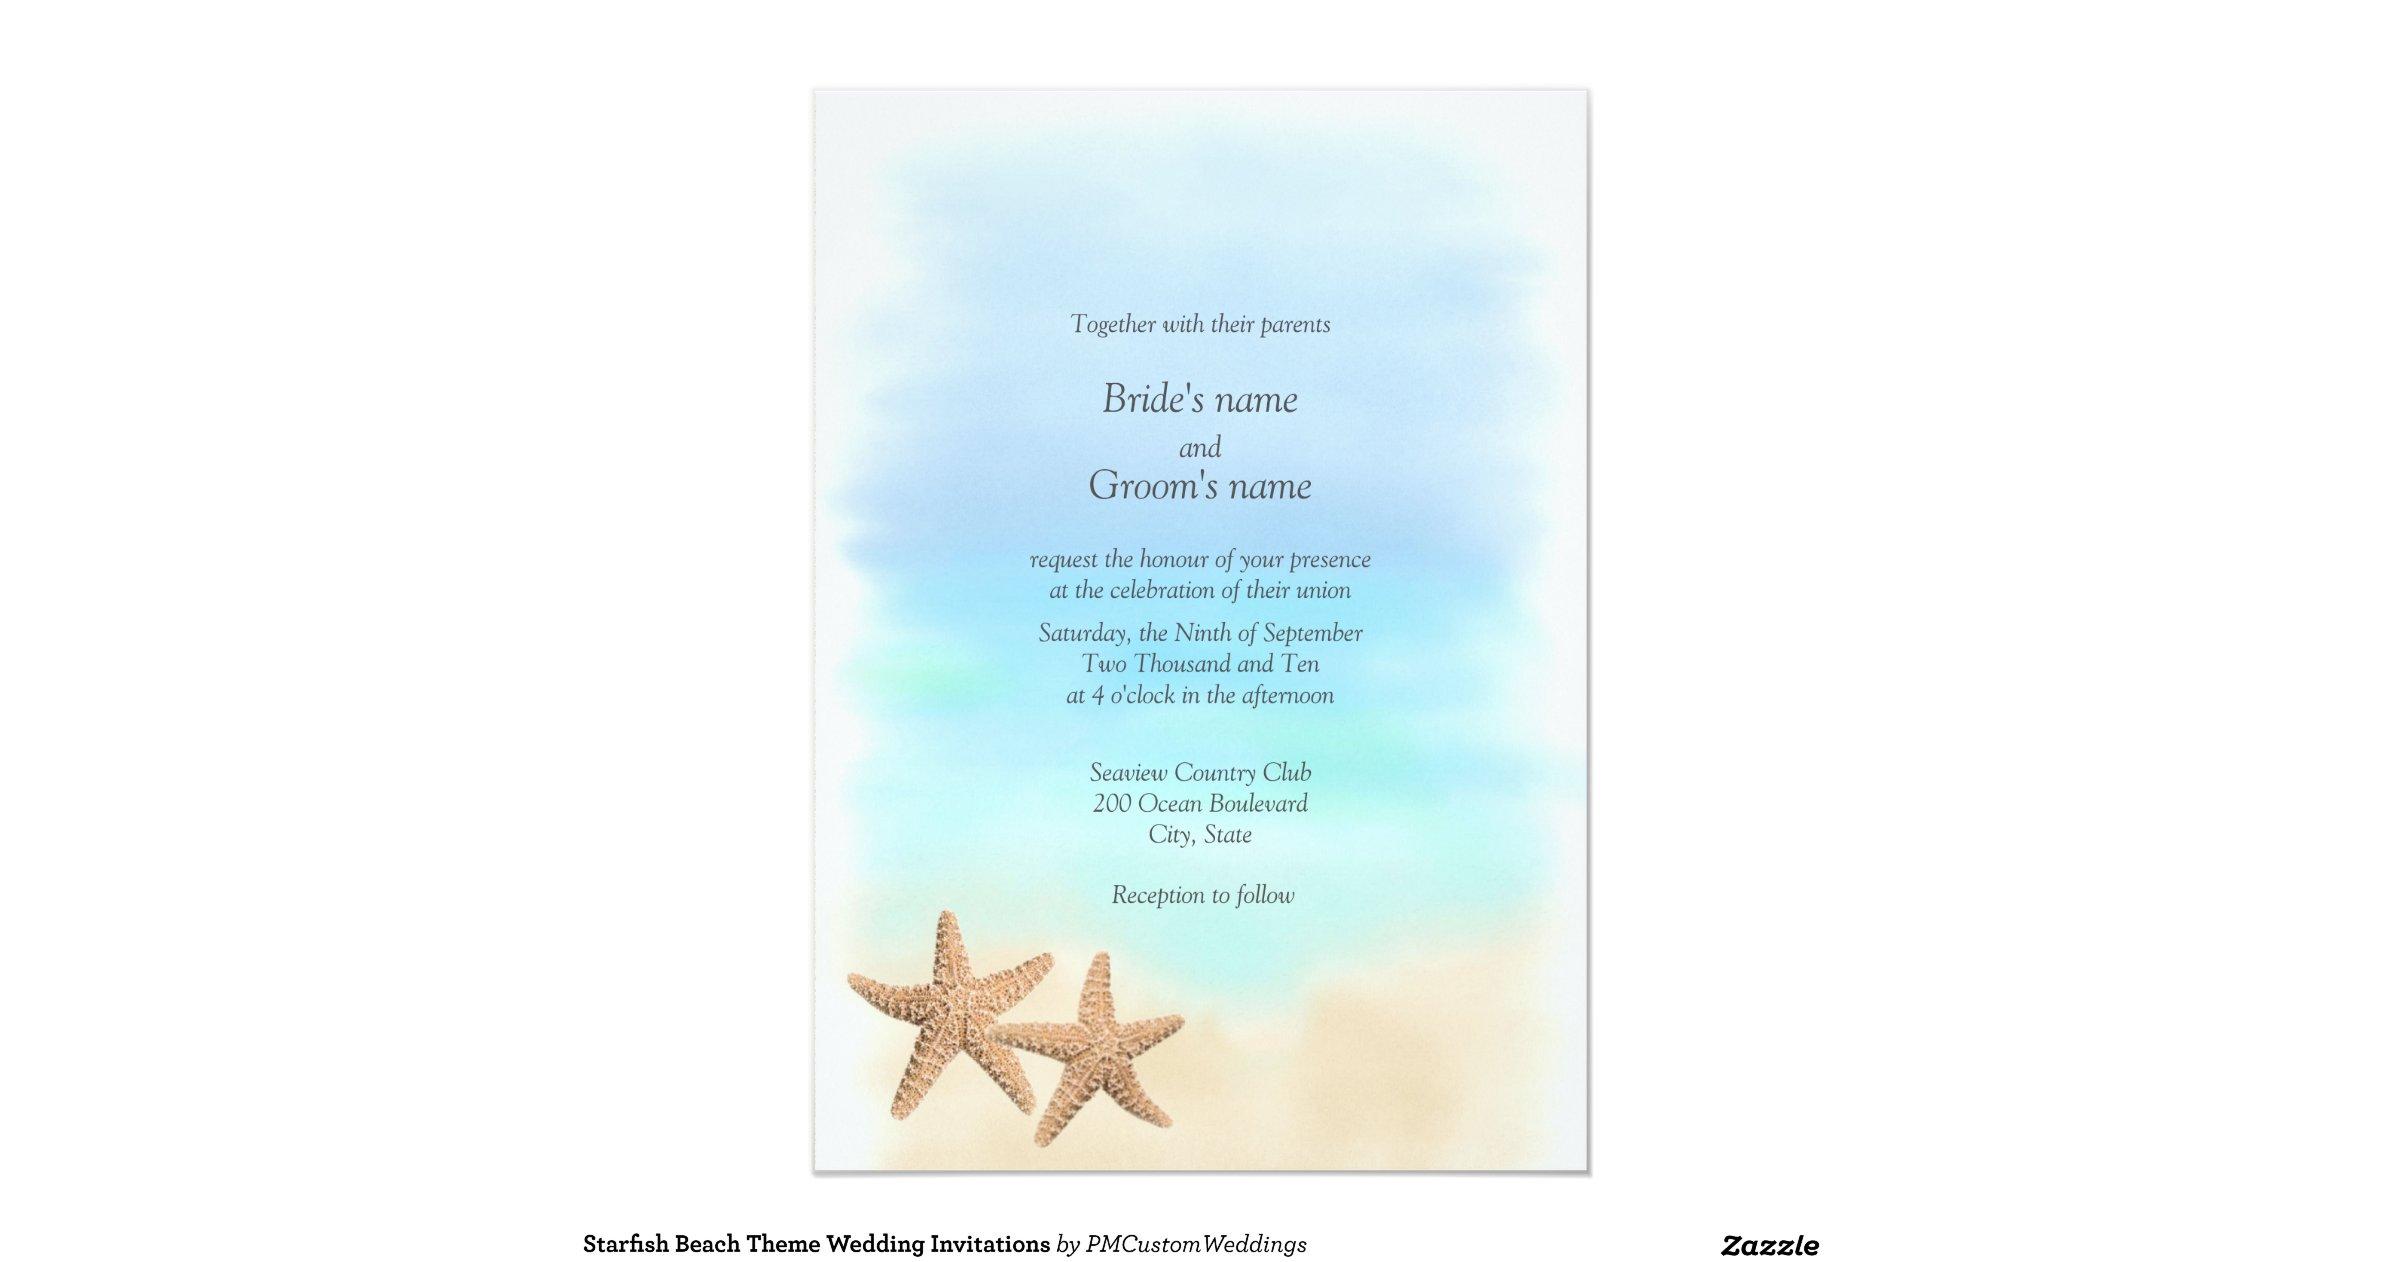 Beach Theme Wedding Invitation: Starfish_beach_theme_wedding_invitations